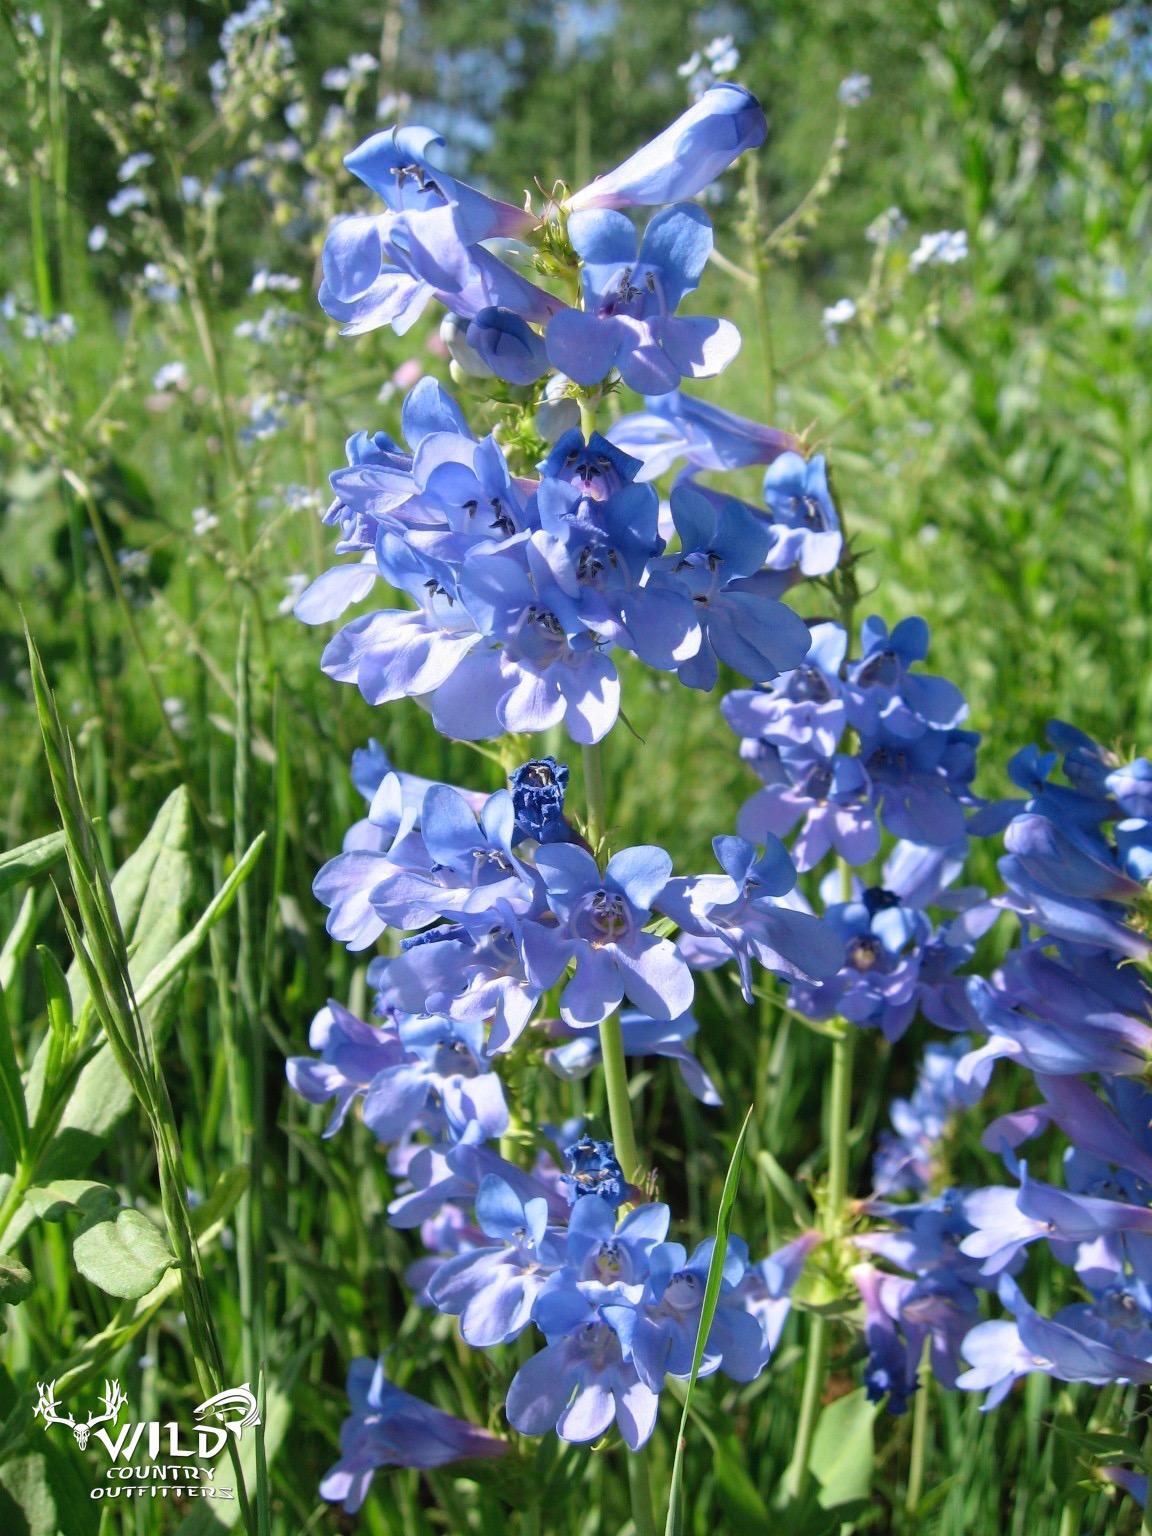 Deseret ranch utah rocky moutains wild flowers.jpg